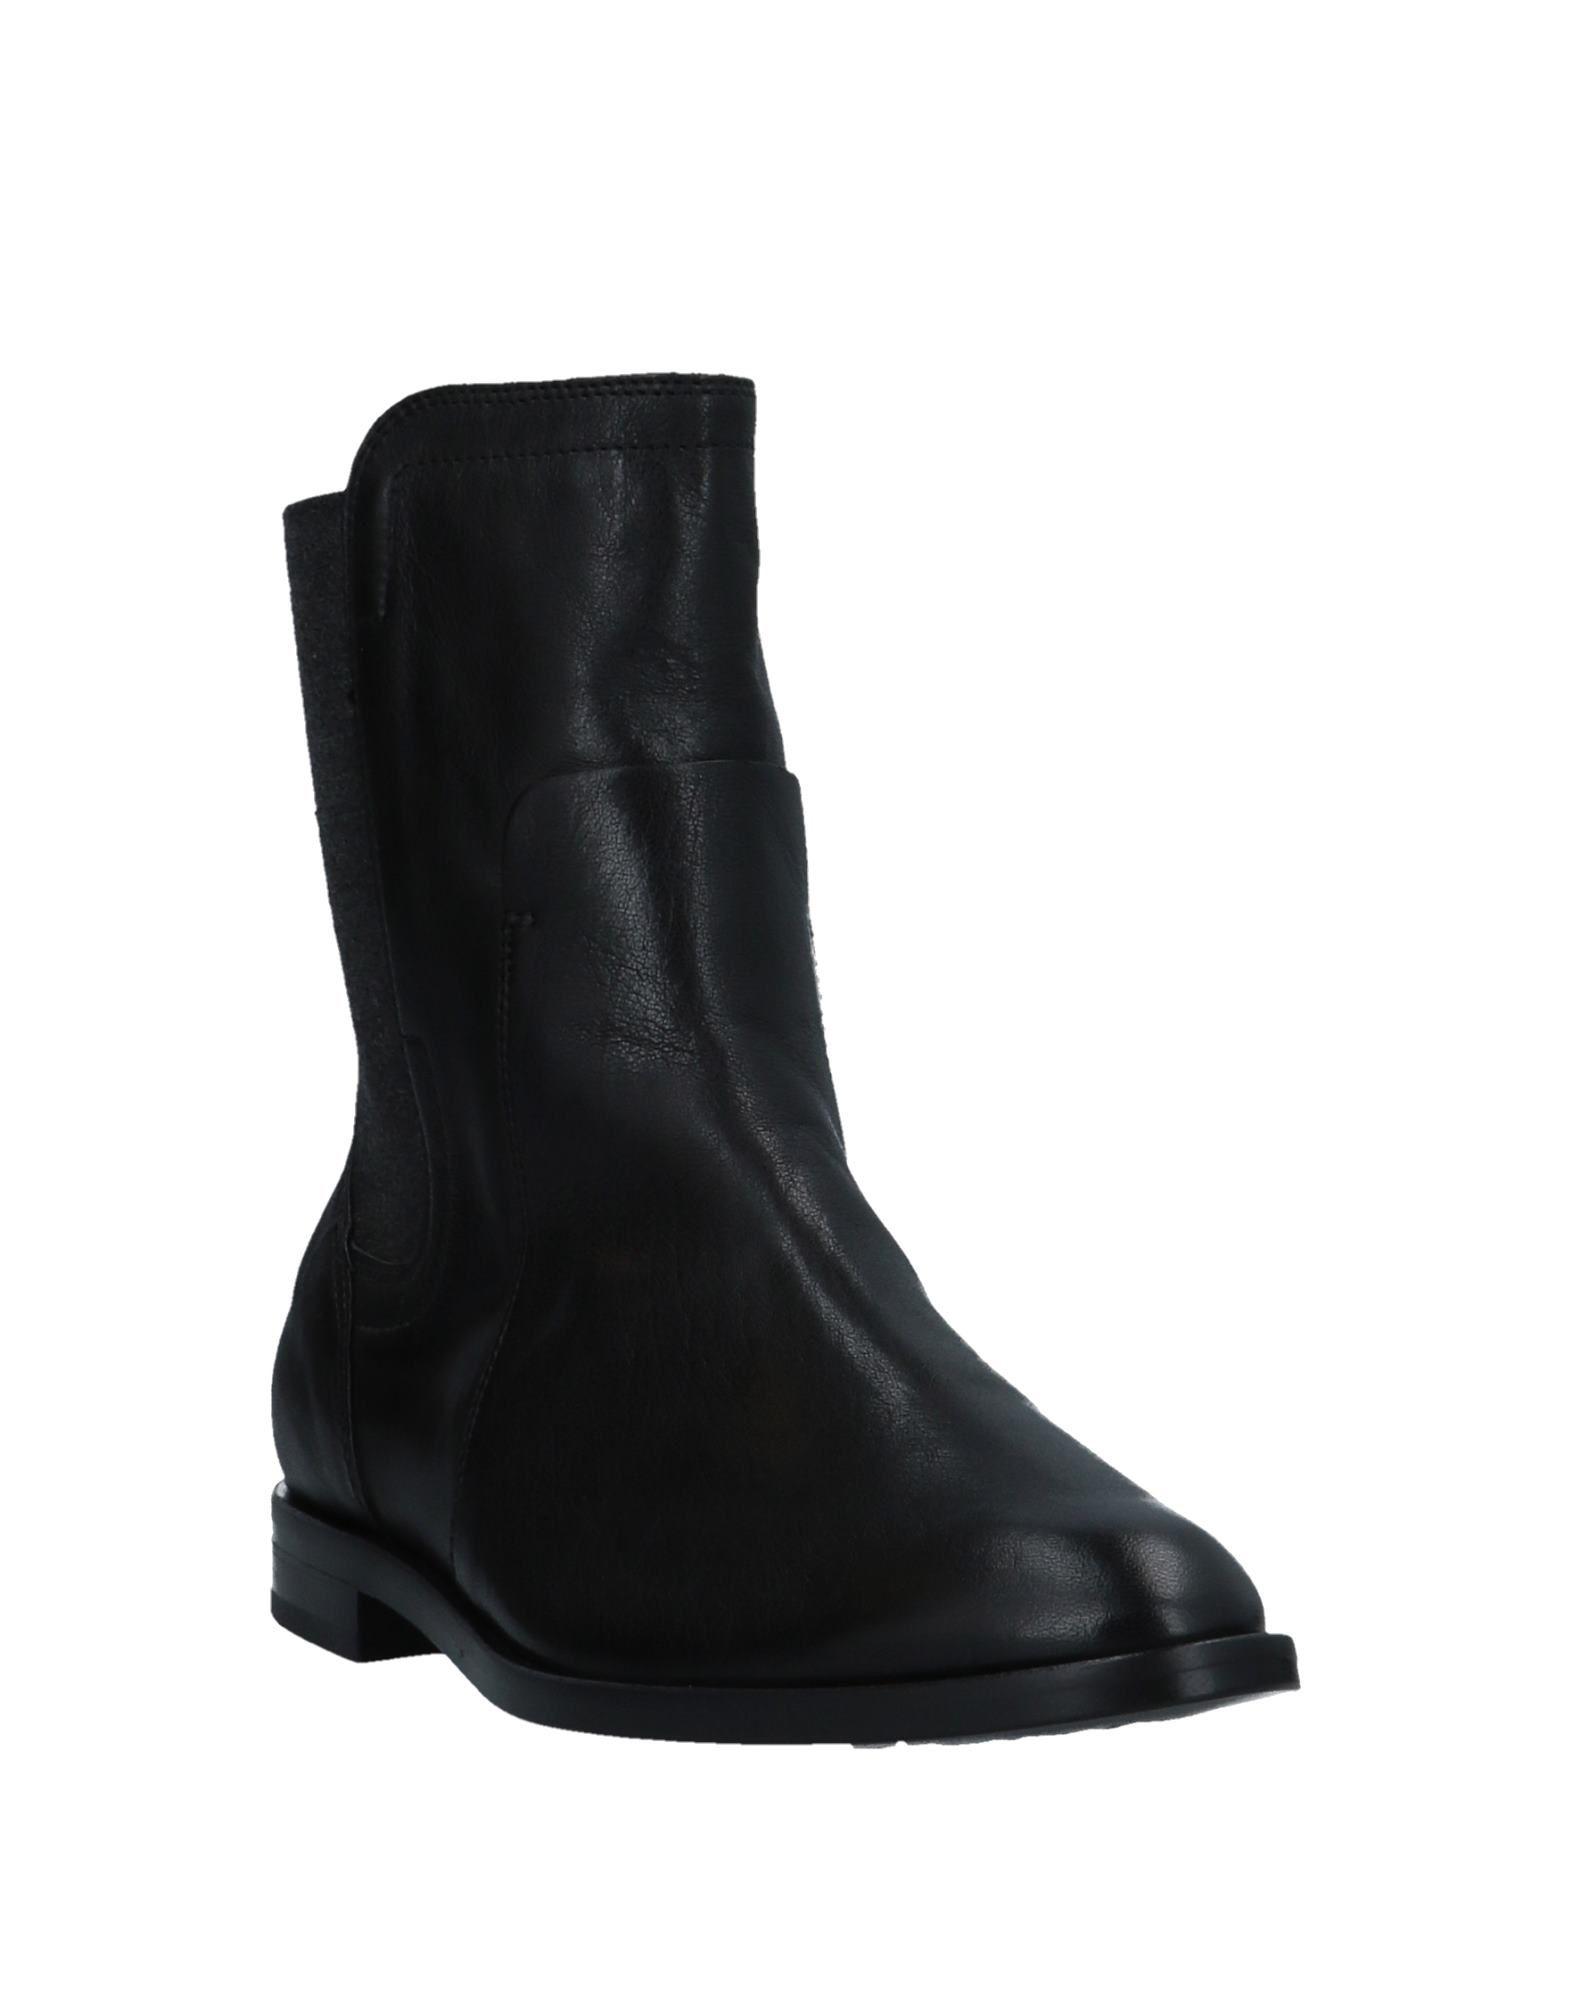 Alberto Fermani 11535225MHGut Stiefelette Damen  11535225MHGut Fermani aussehende strapazierfähige Schuhe 42622c